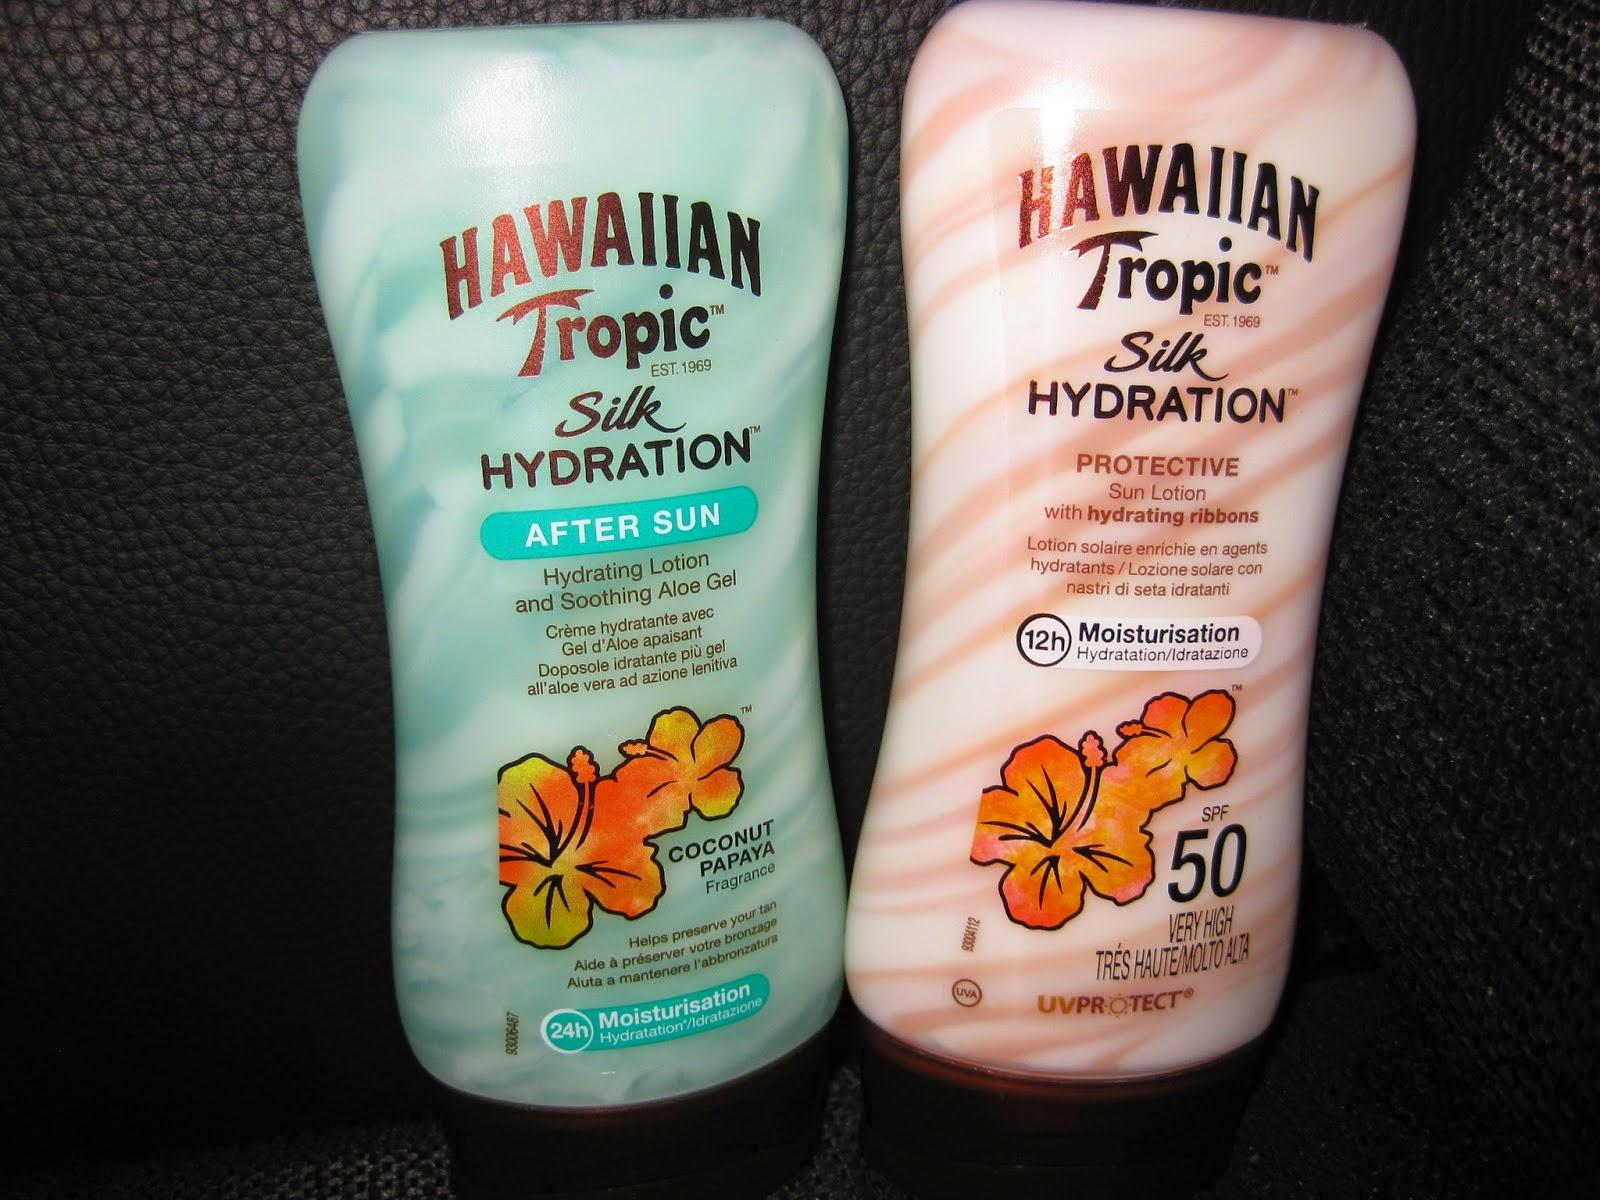 http://www.miarmariodepapel.com/2013/07/duo-de-productos-hawaiian-tropic-para.html